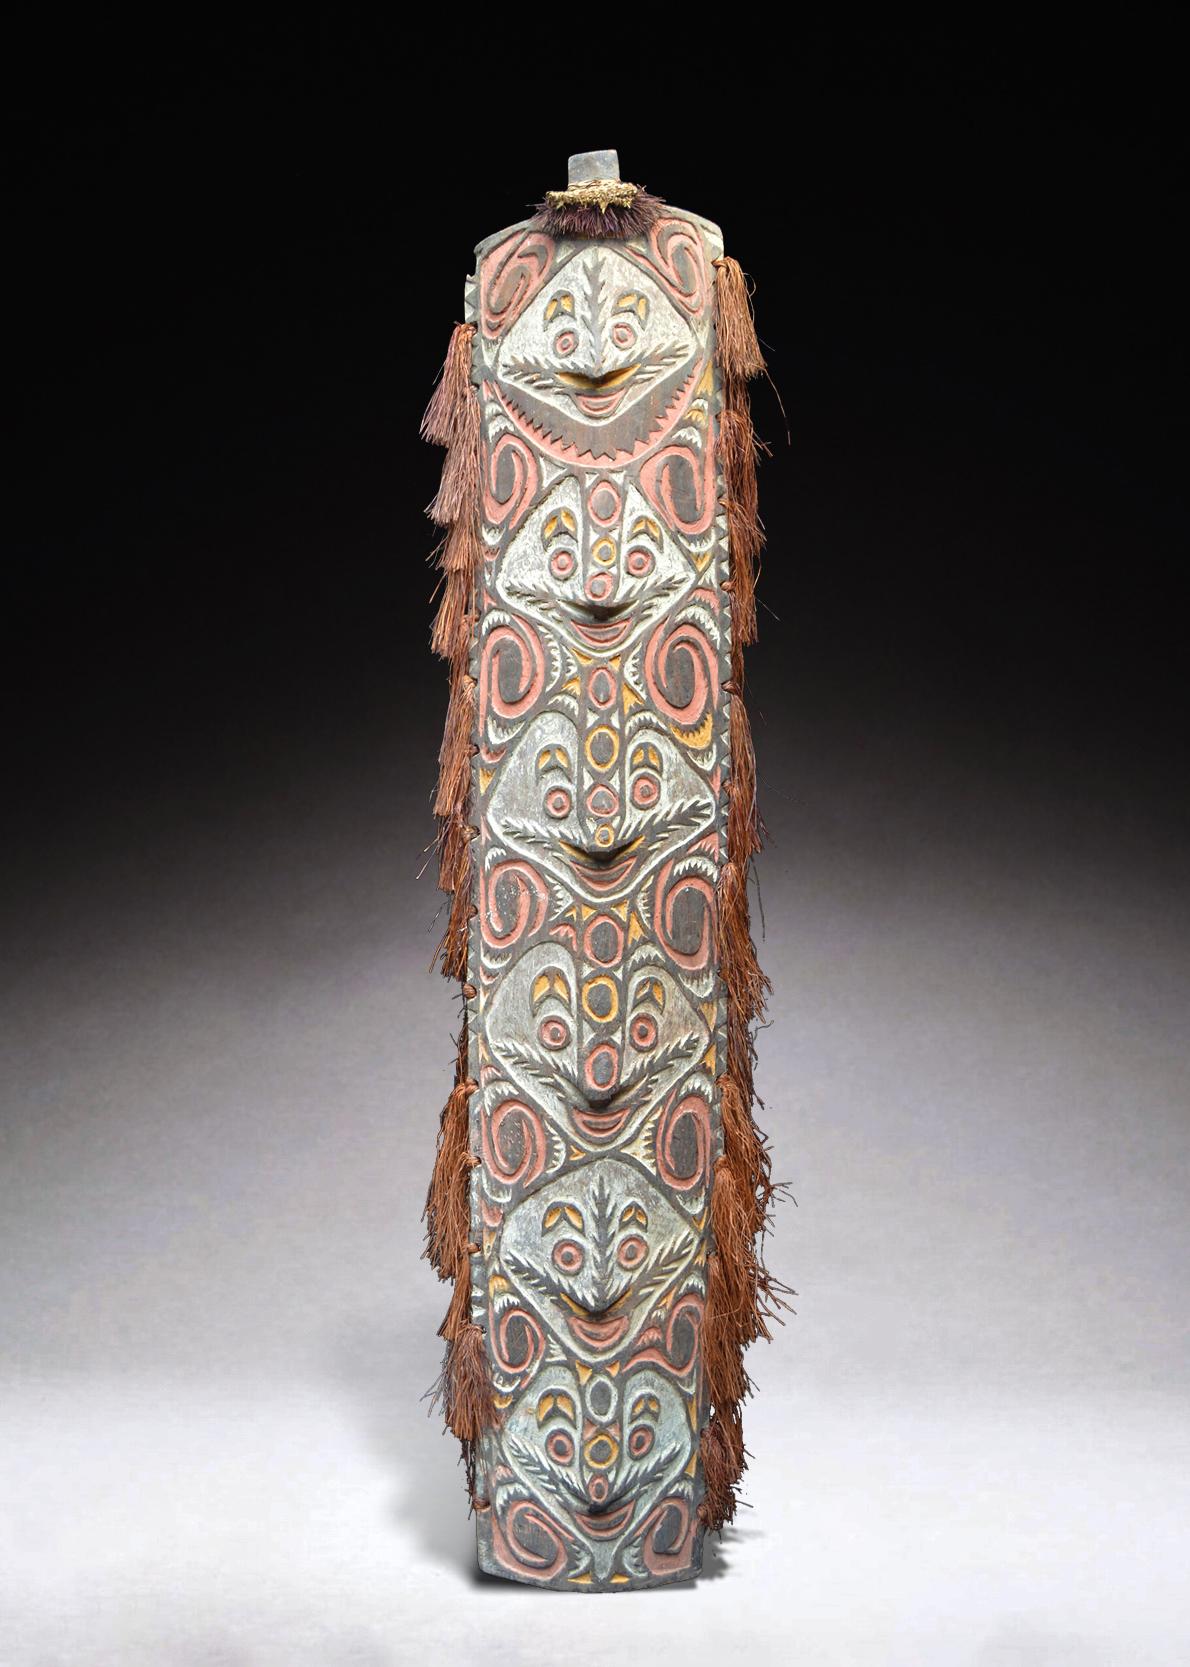 A Fine Old Yuat River Shield